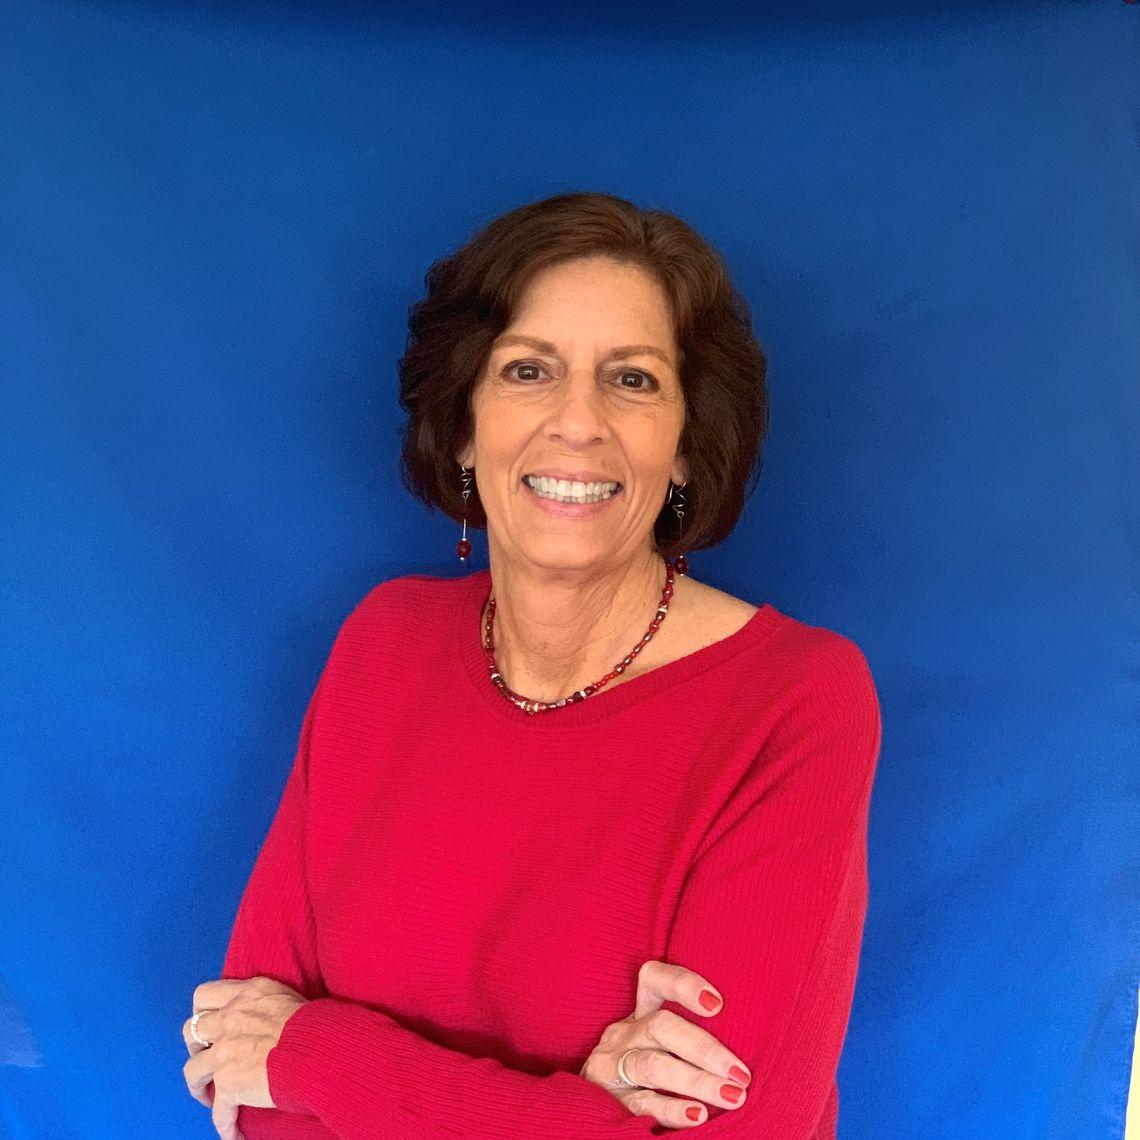 Janice Meinert